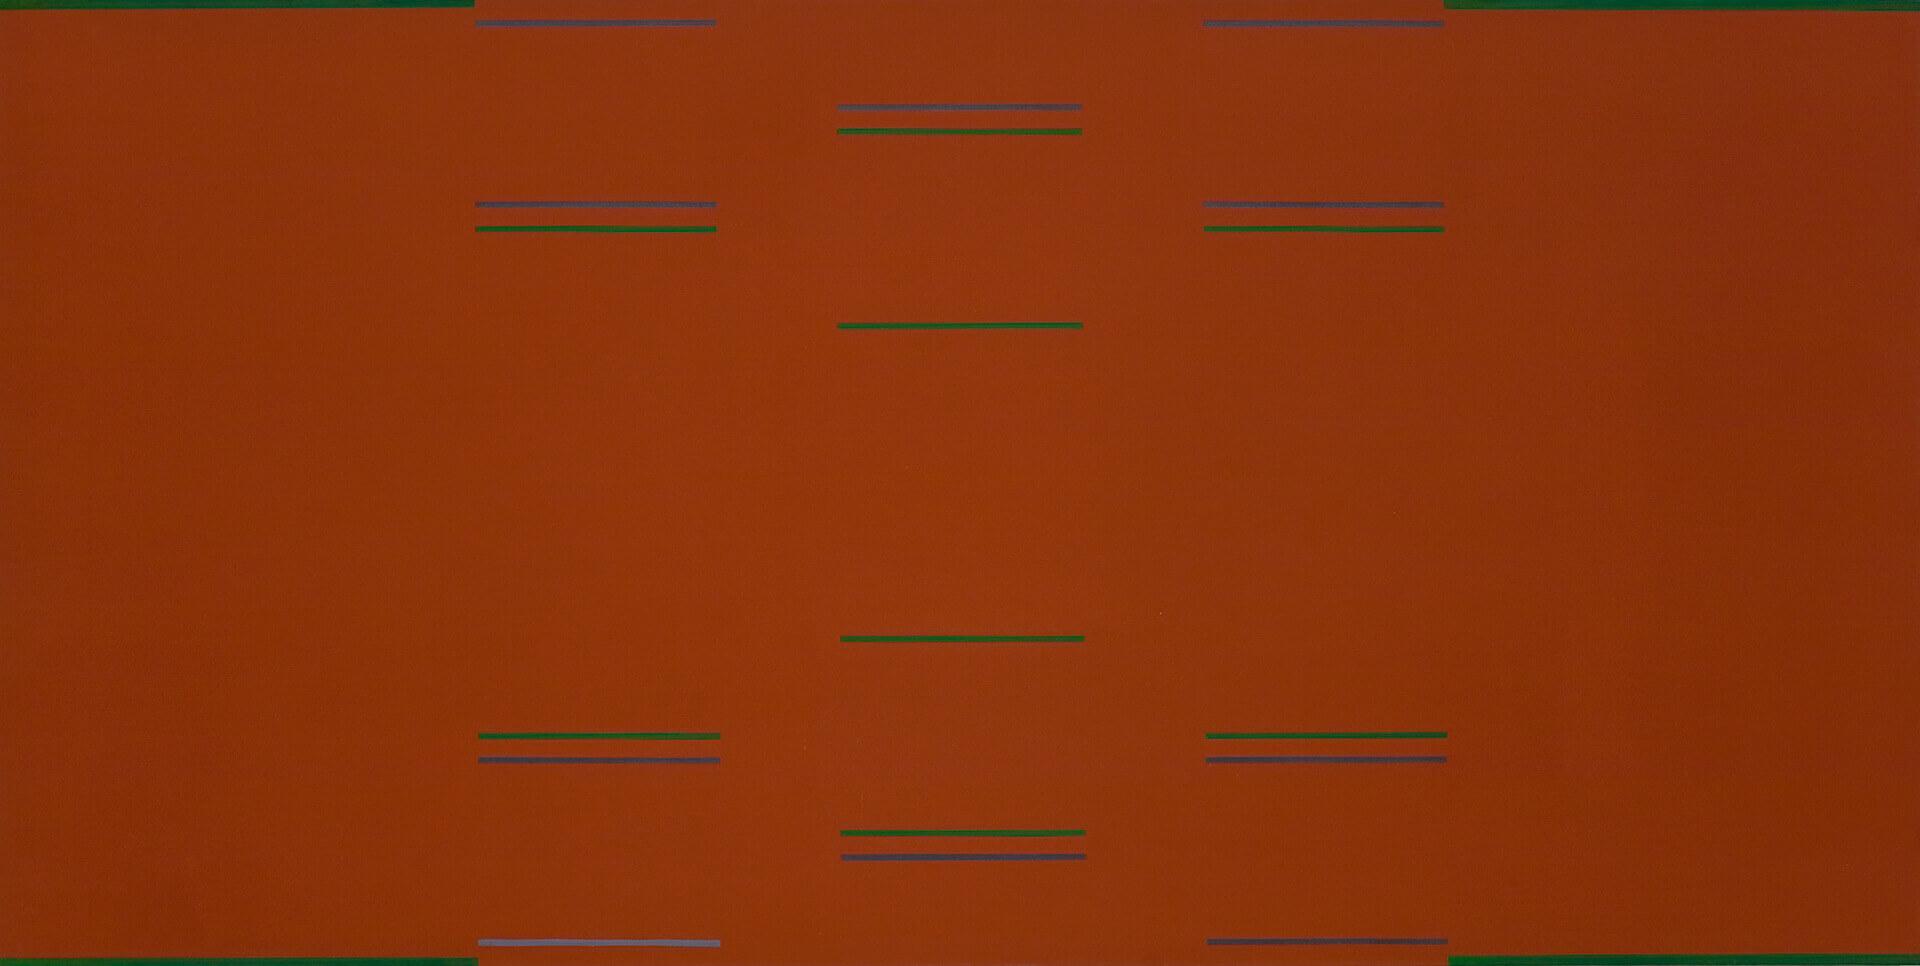 Yves Gaucher,Dusk, Calm, Signals, 1966